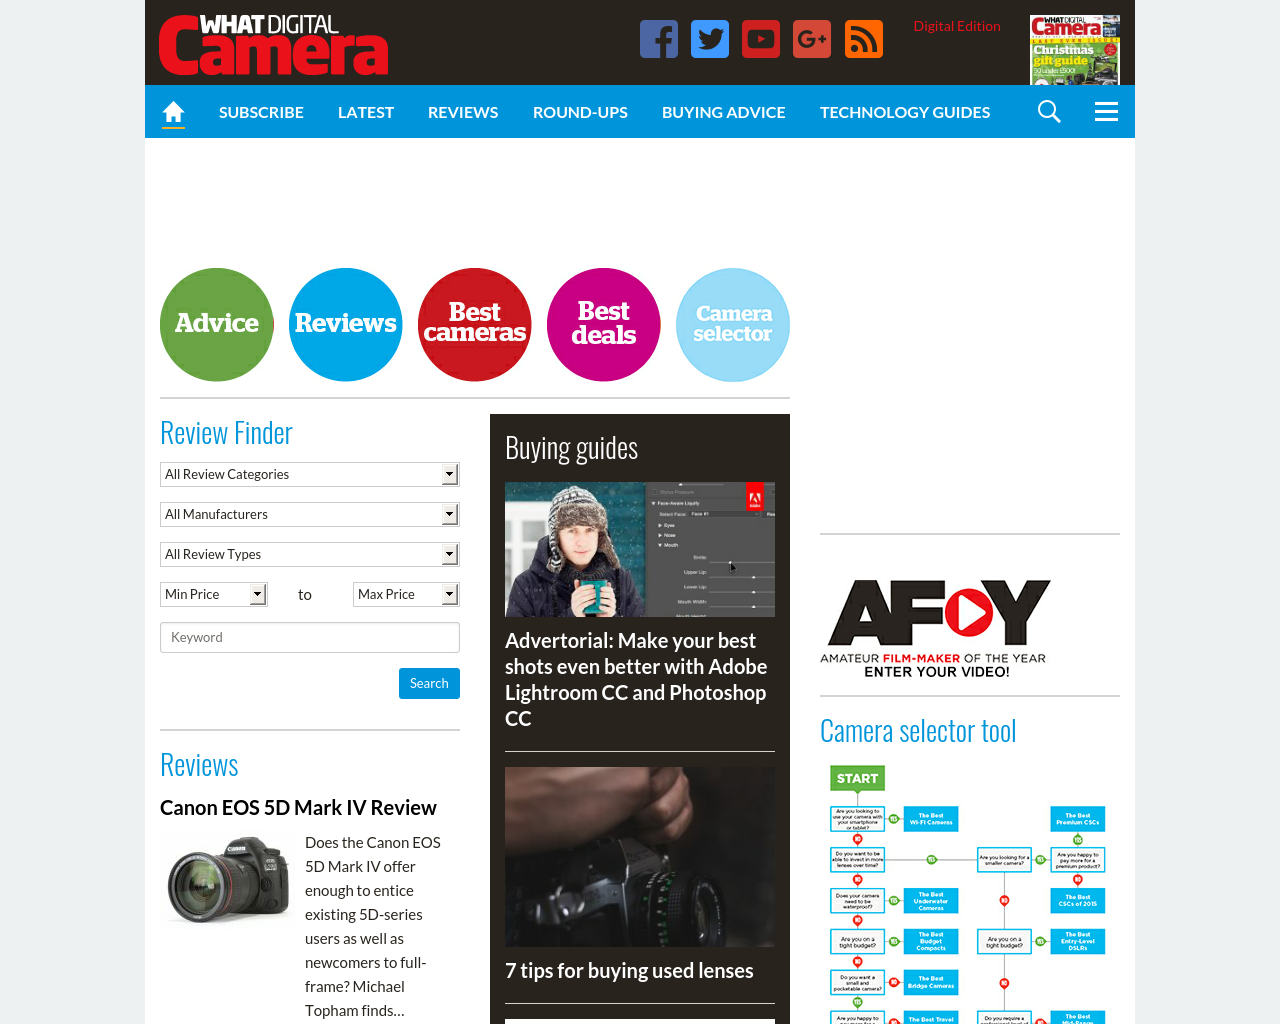 What-Digital-Camera-Advertising-Reviews-Pricing